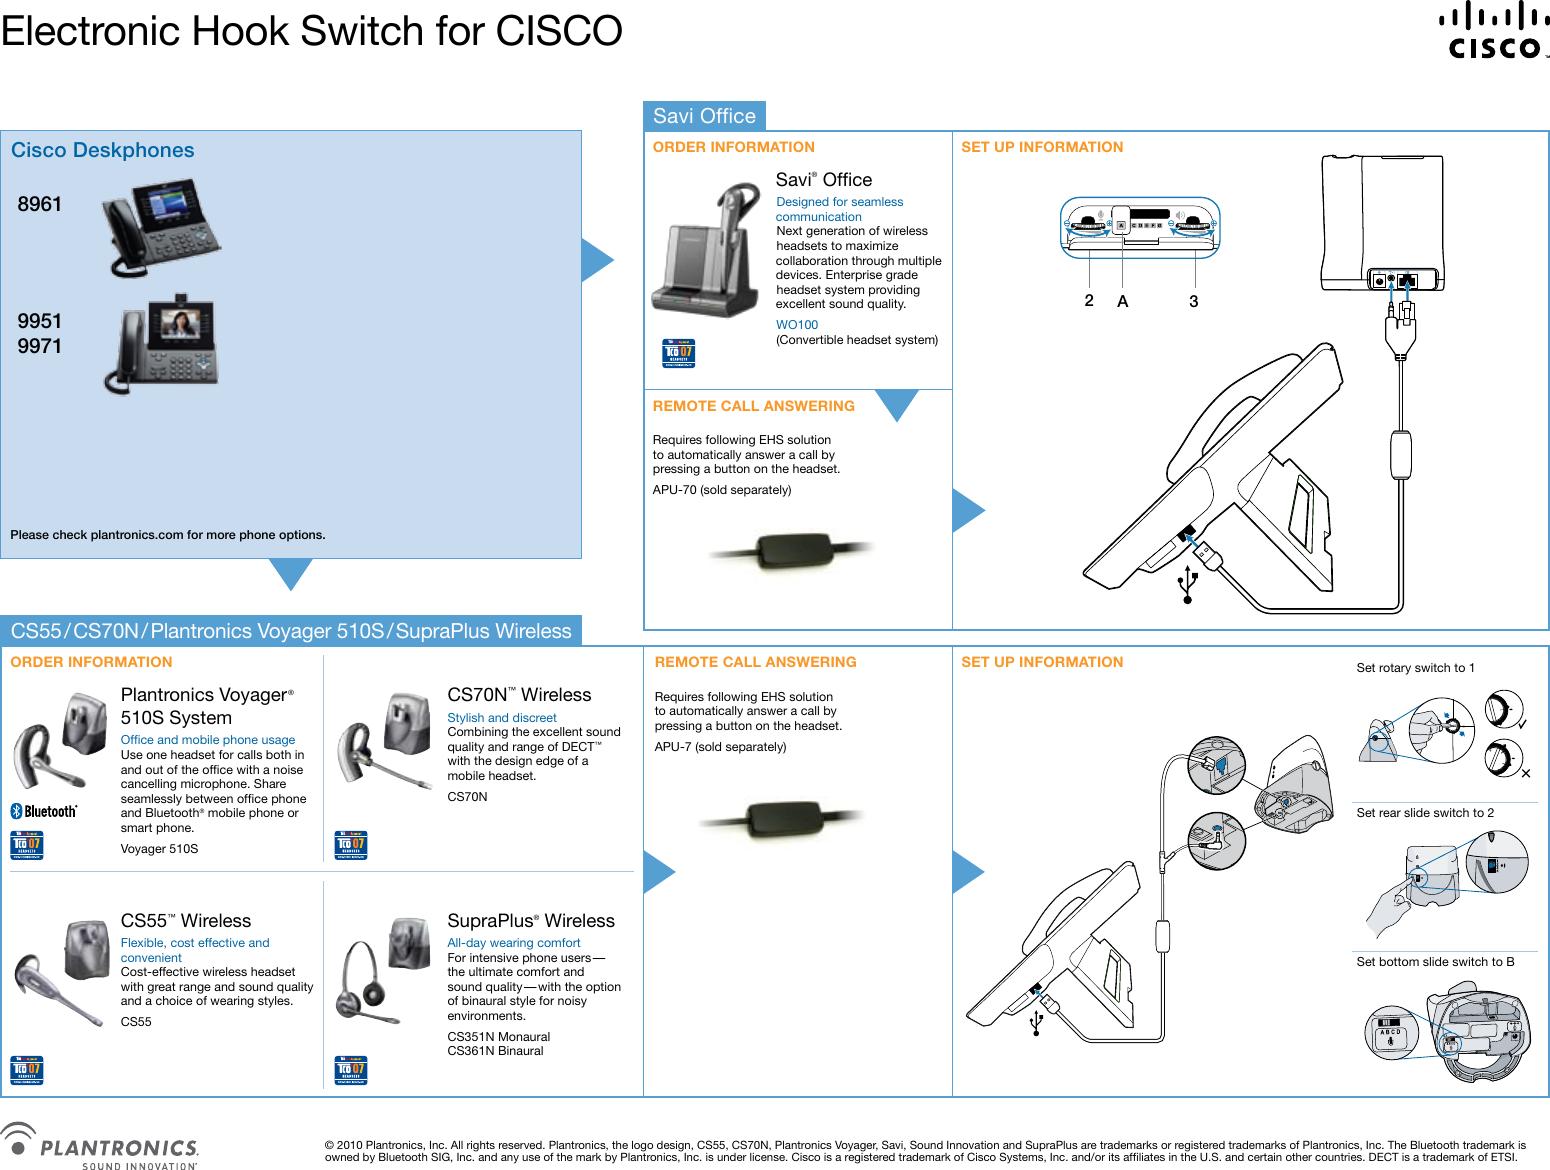 Supra Plus Wireless Headset System Ehs Guide Cisco En?WT